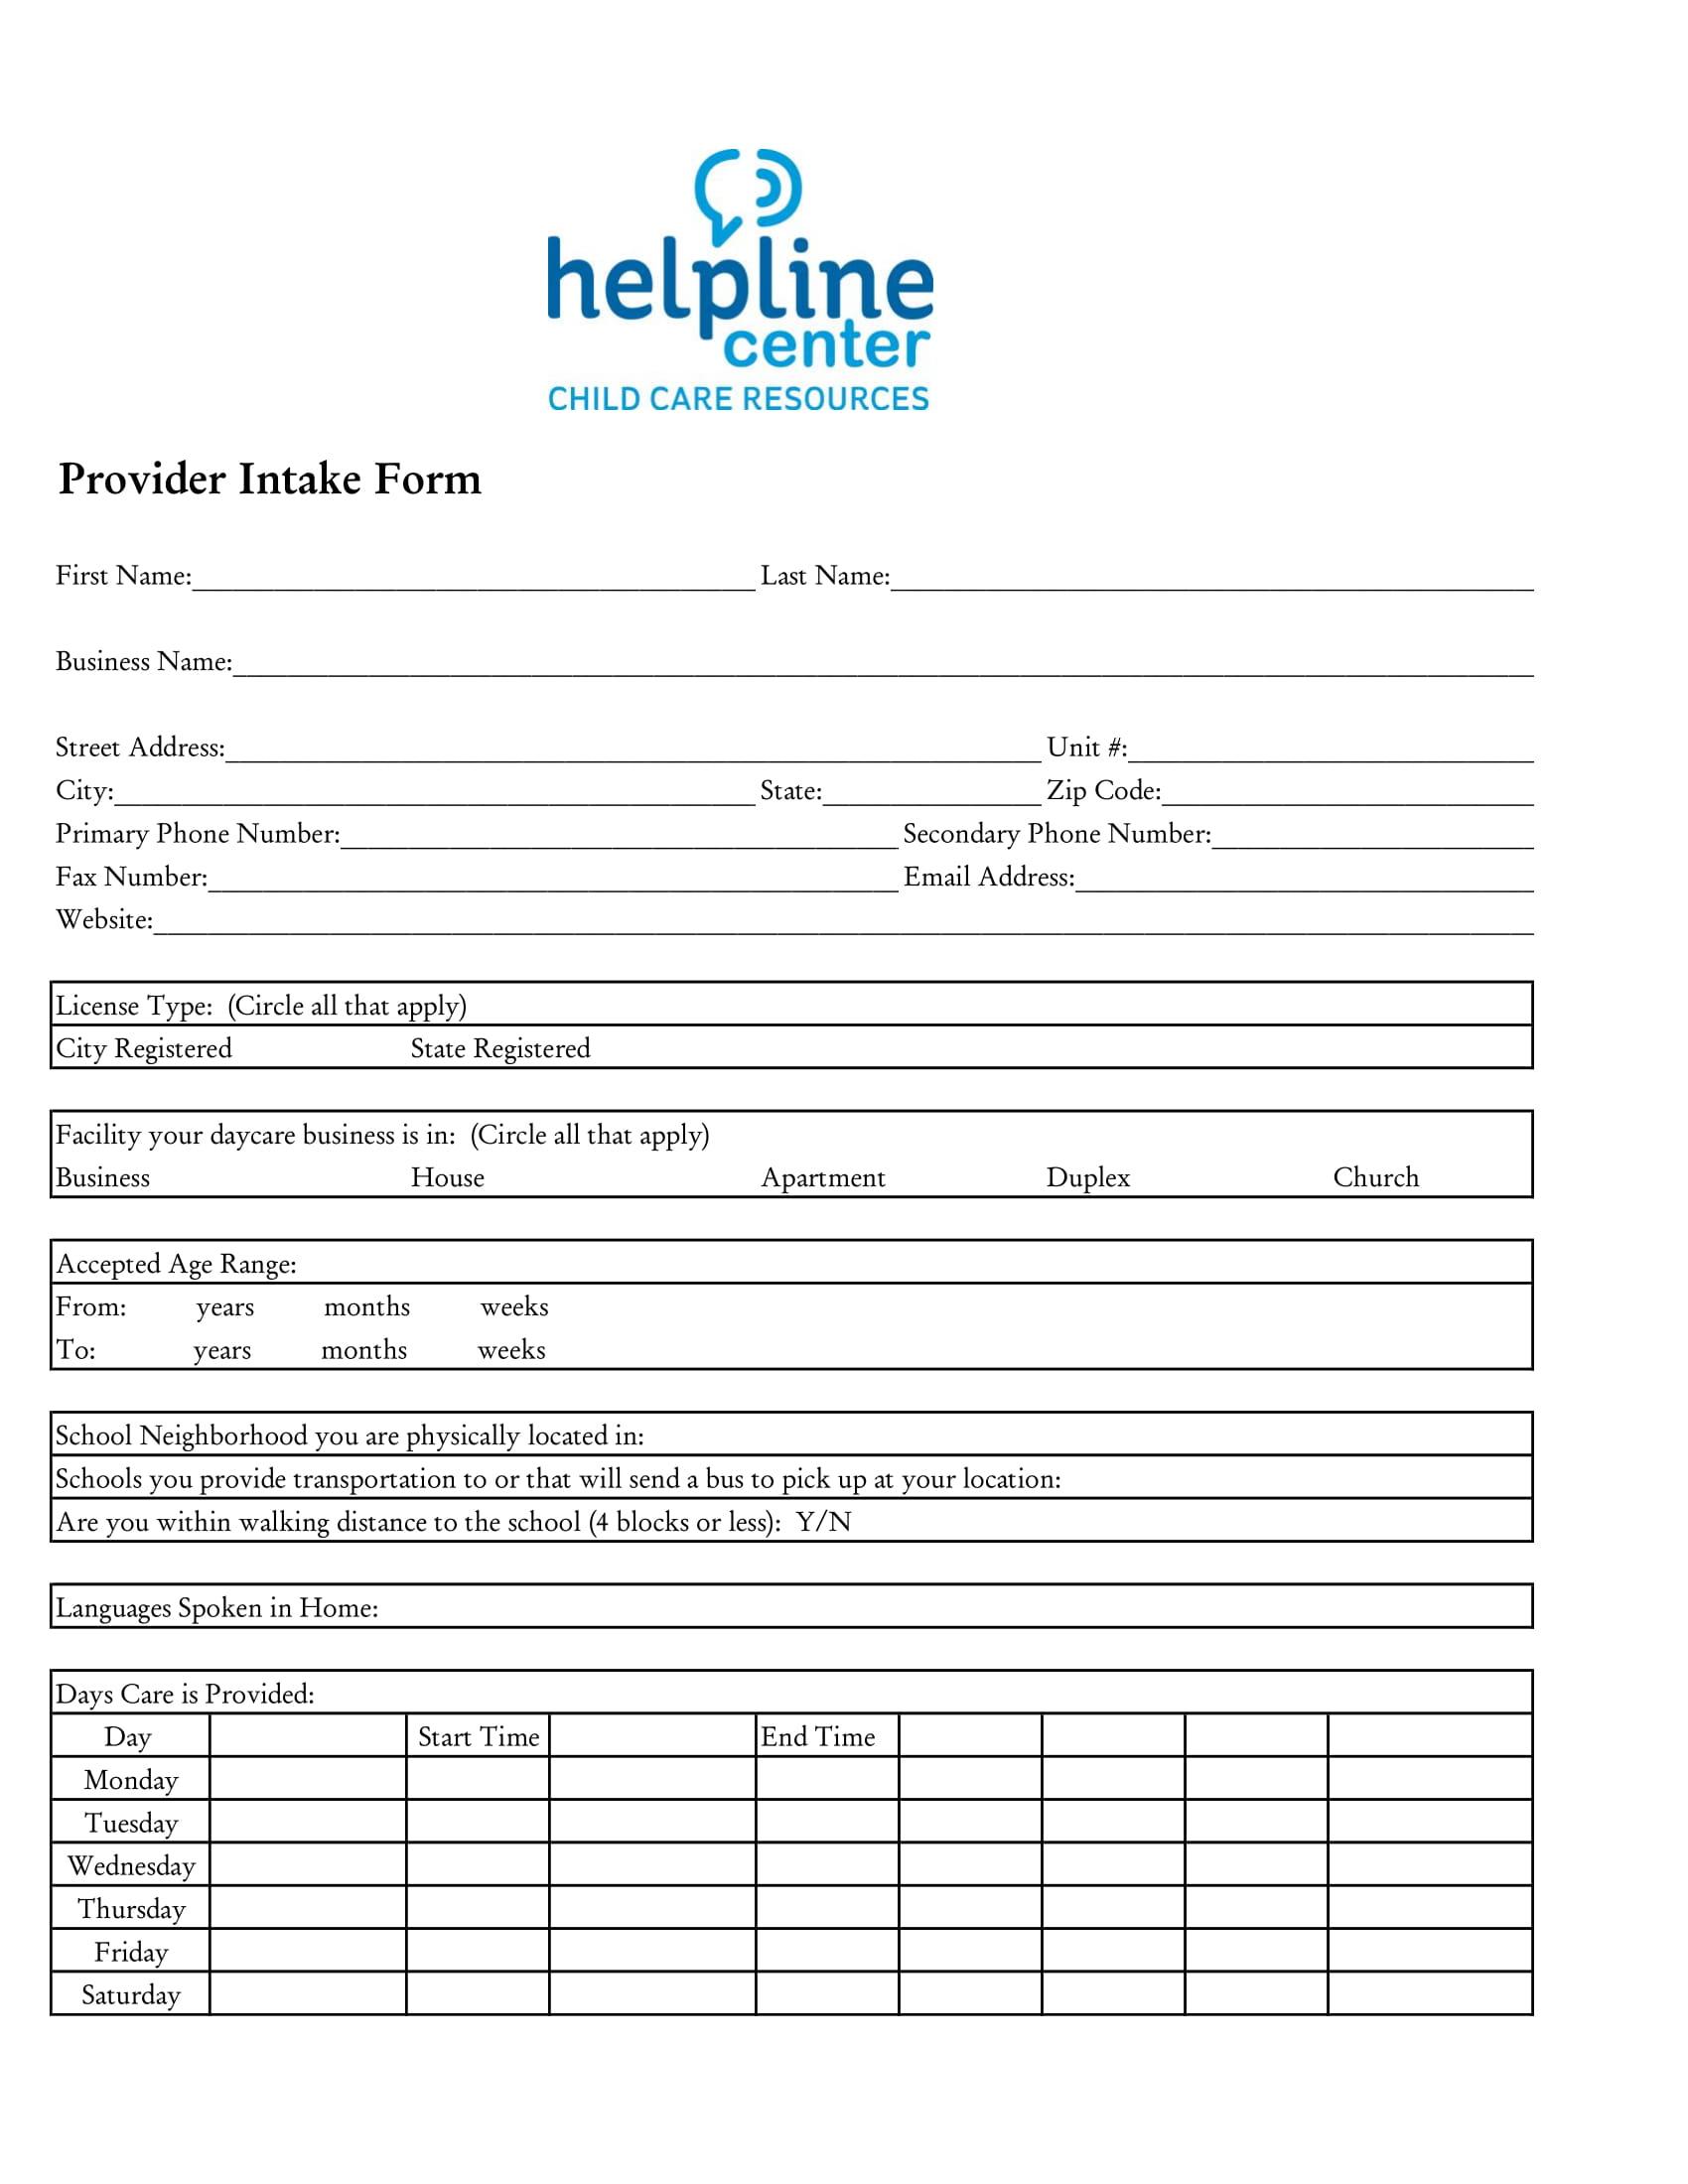 childcare provider intake form 1